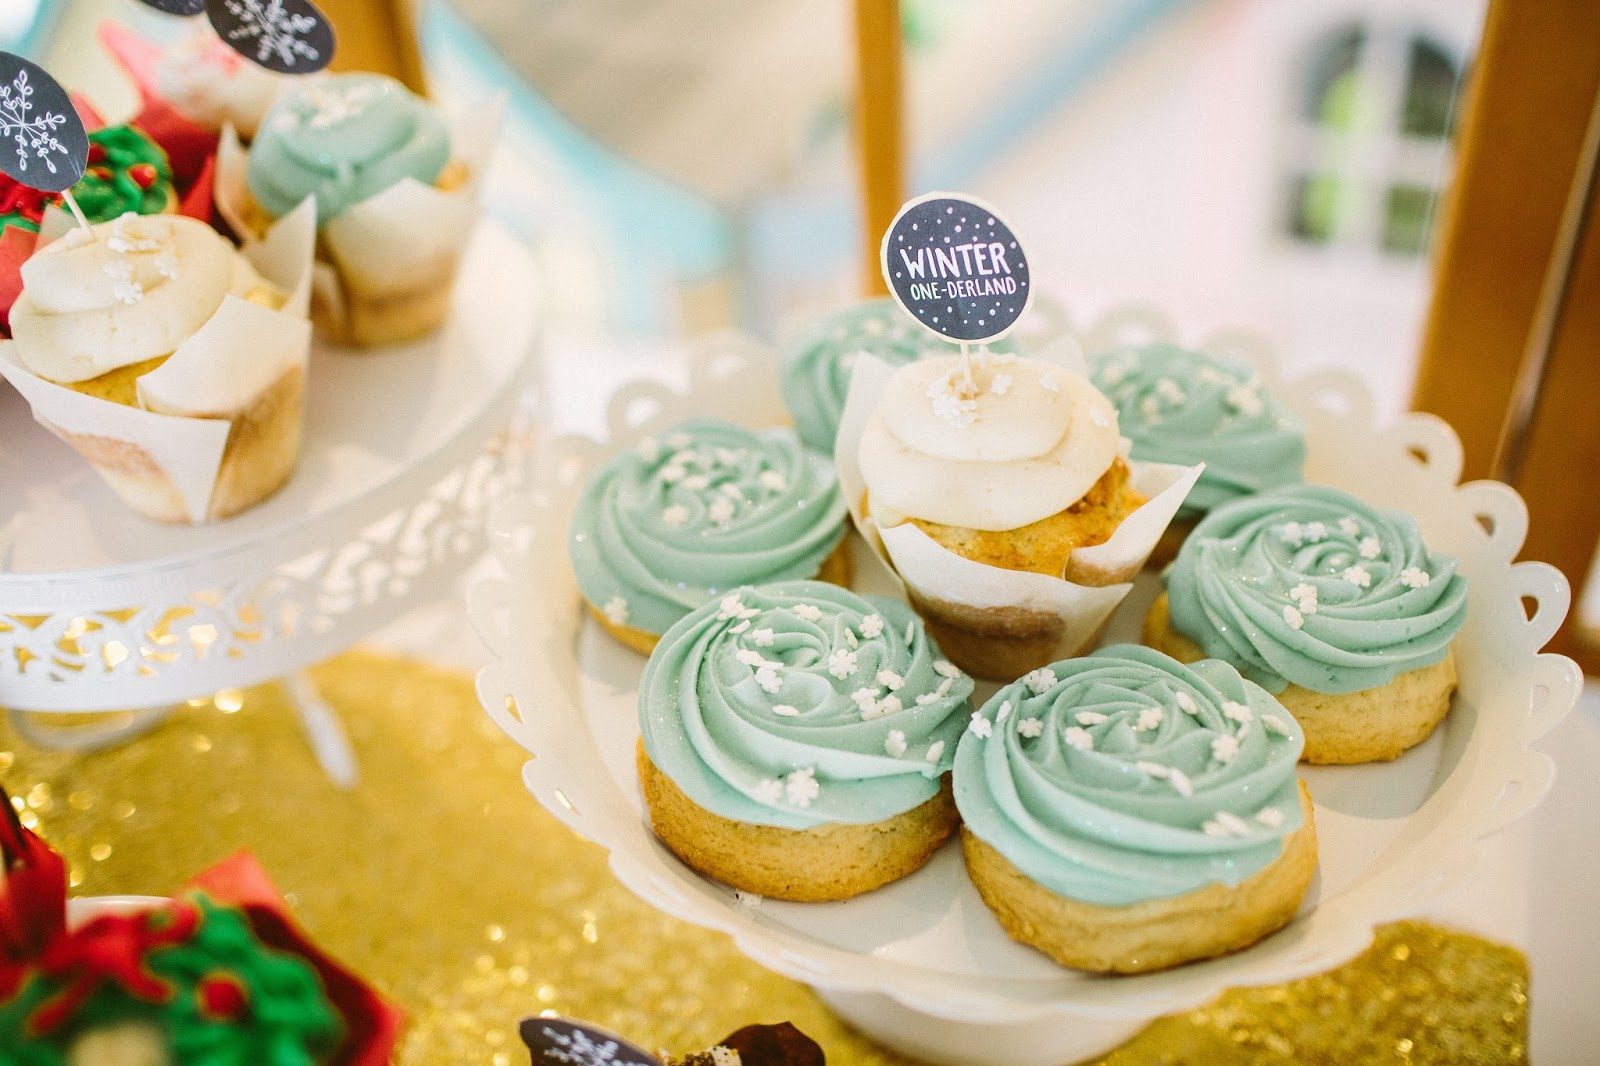 Sugar Cookes, Winter Onederland Treats, Birthday Party Sugar Cookies